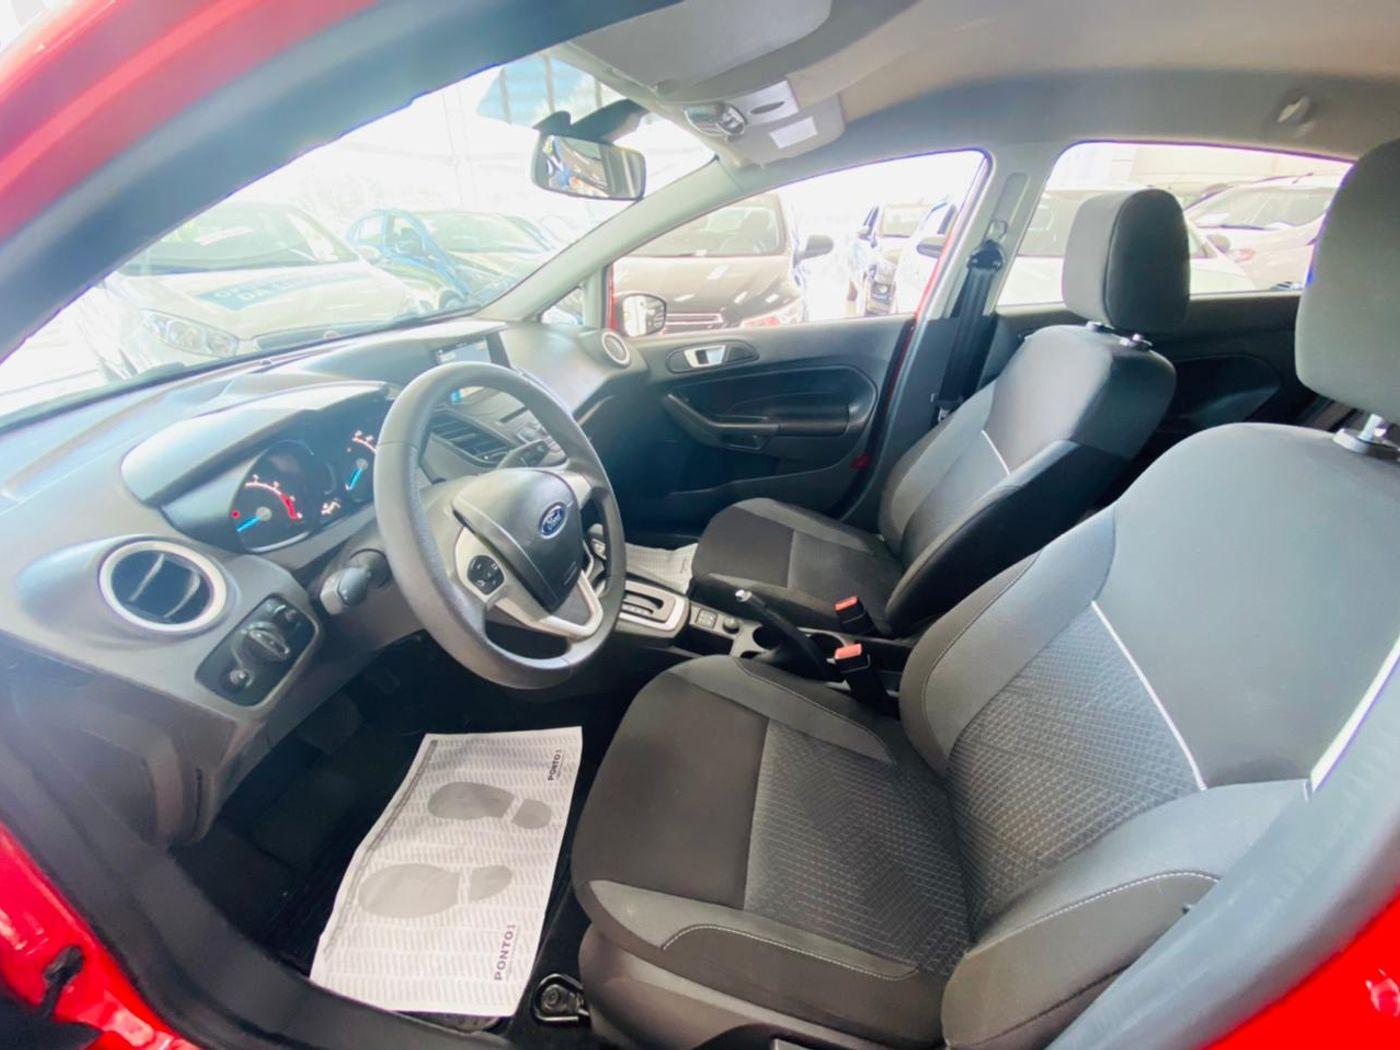 Ford Fiesta SE Plus 1.6 16V Flex Aut. 5p